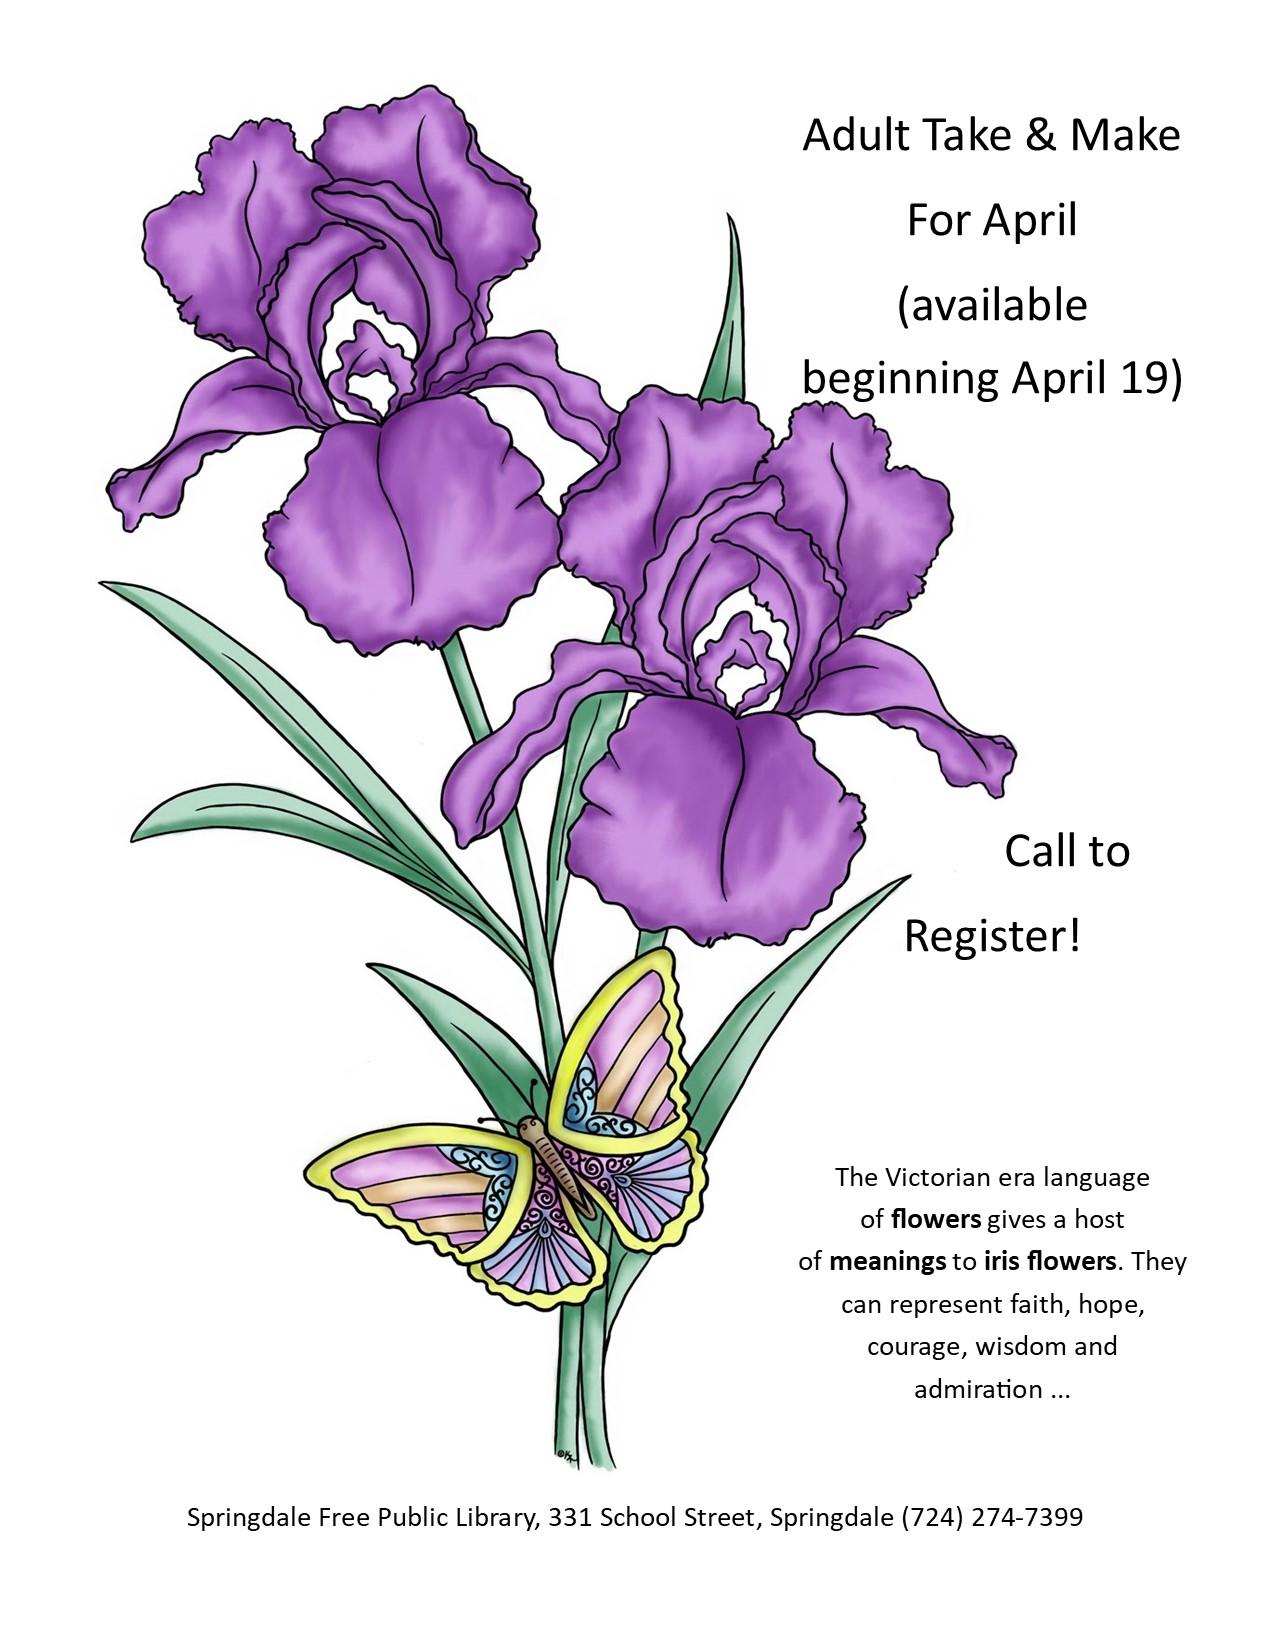 Adult Take & Make Kits for April